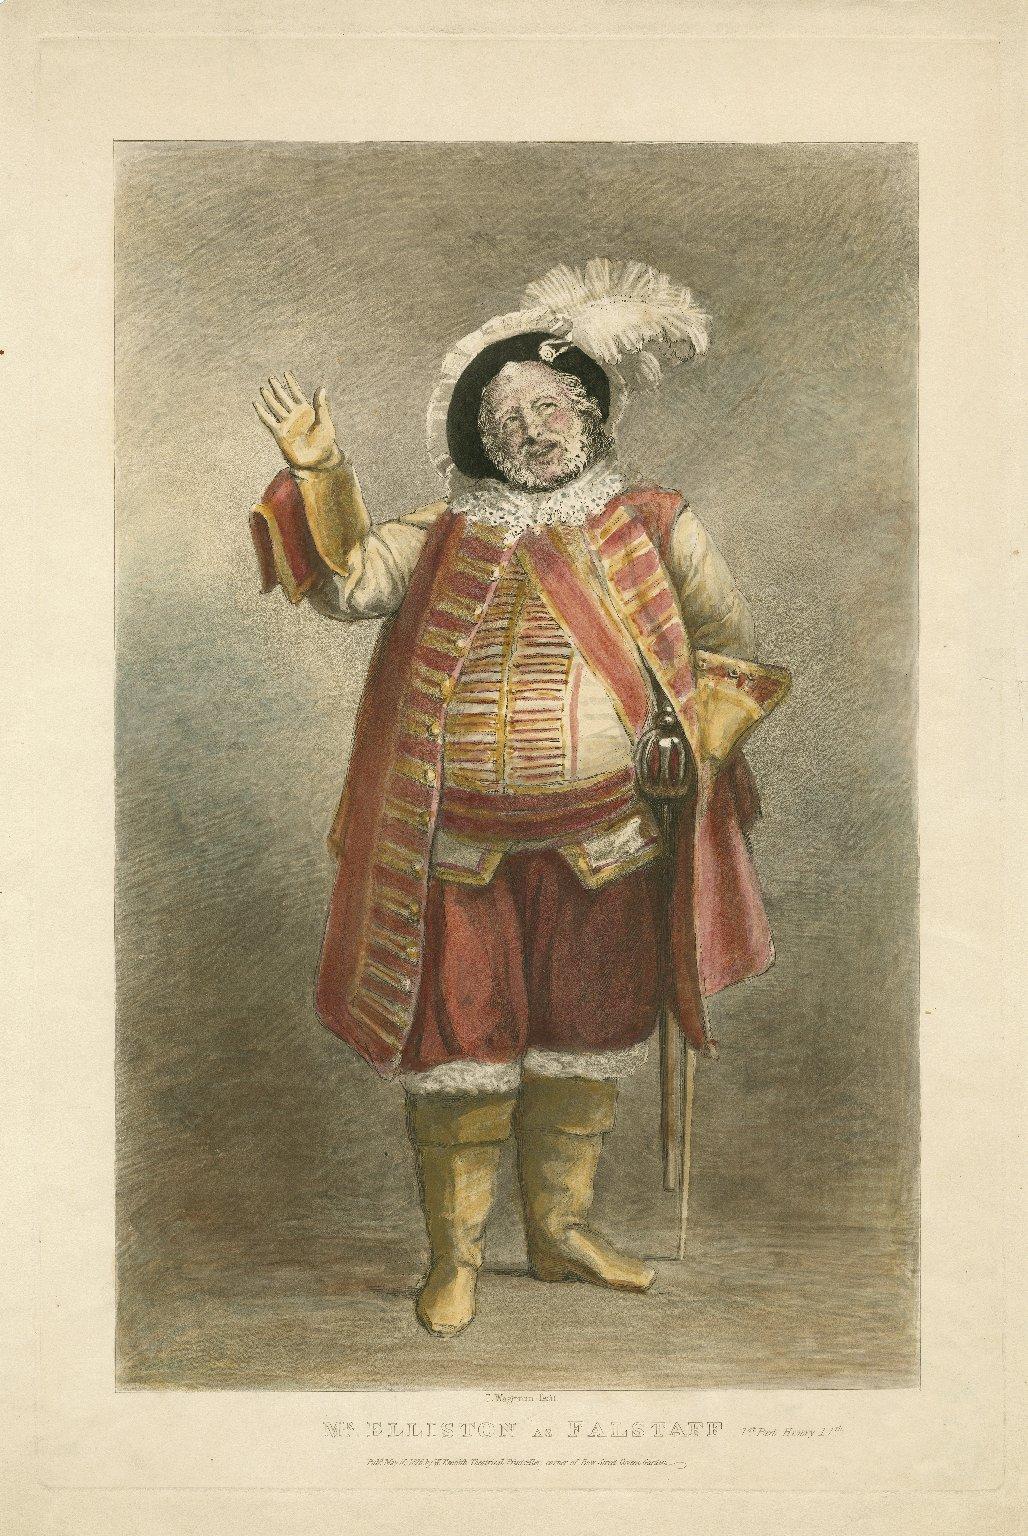 Mr. Elliston as Falstaff, 1st part Henry IVth [graphic] / T. Wageman, fecit.